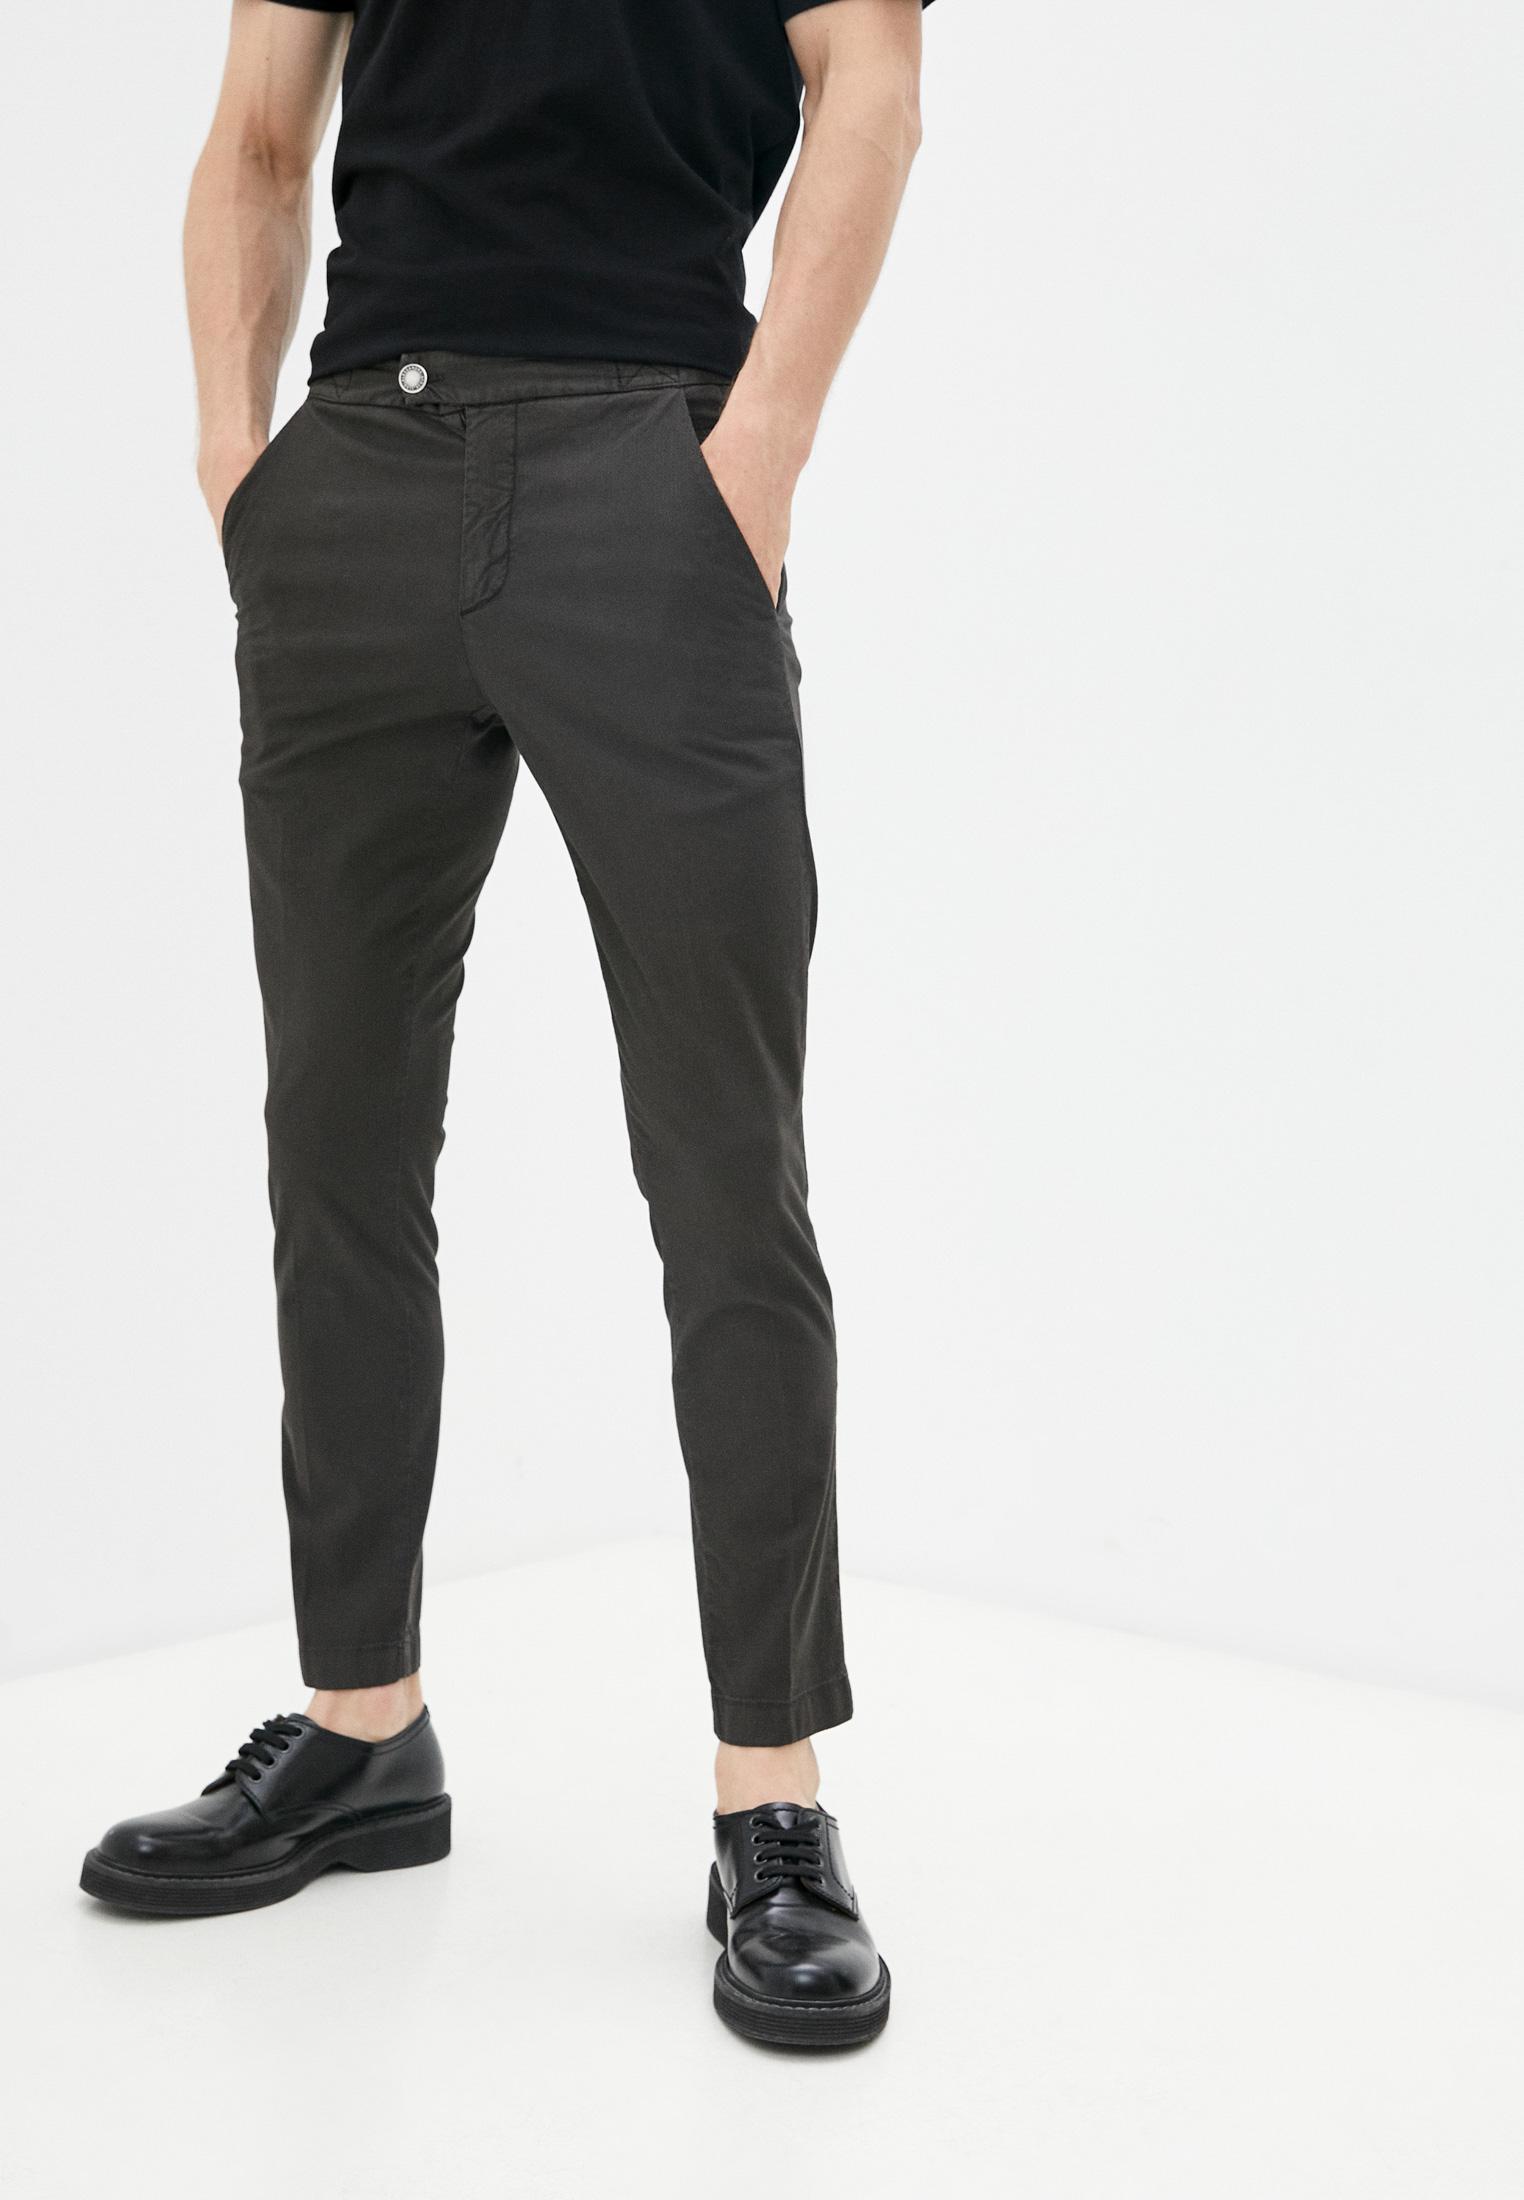 Мужские повседневные брюки Alessandro Dell`acqua Брюки Alessandro Dell'Acqua